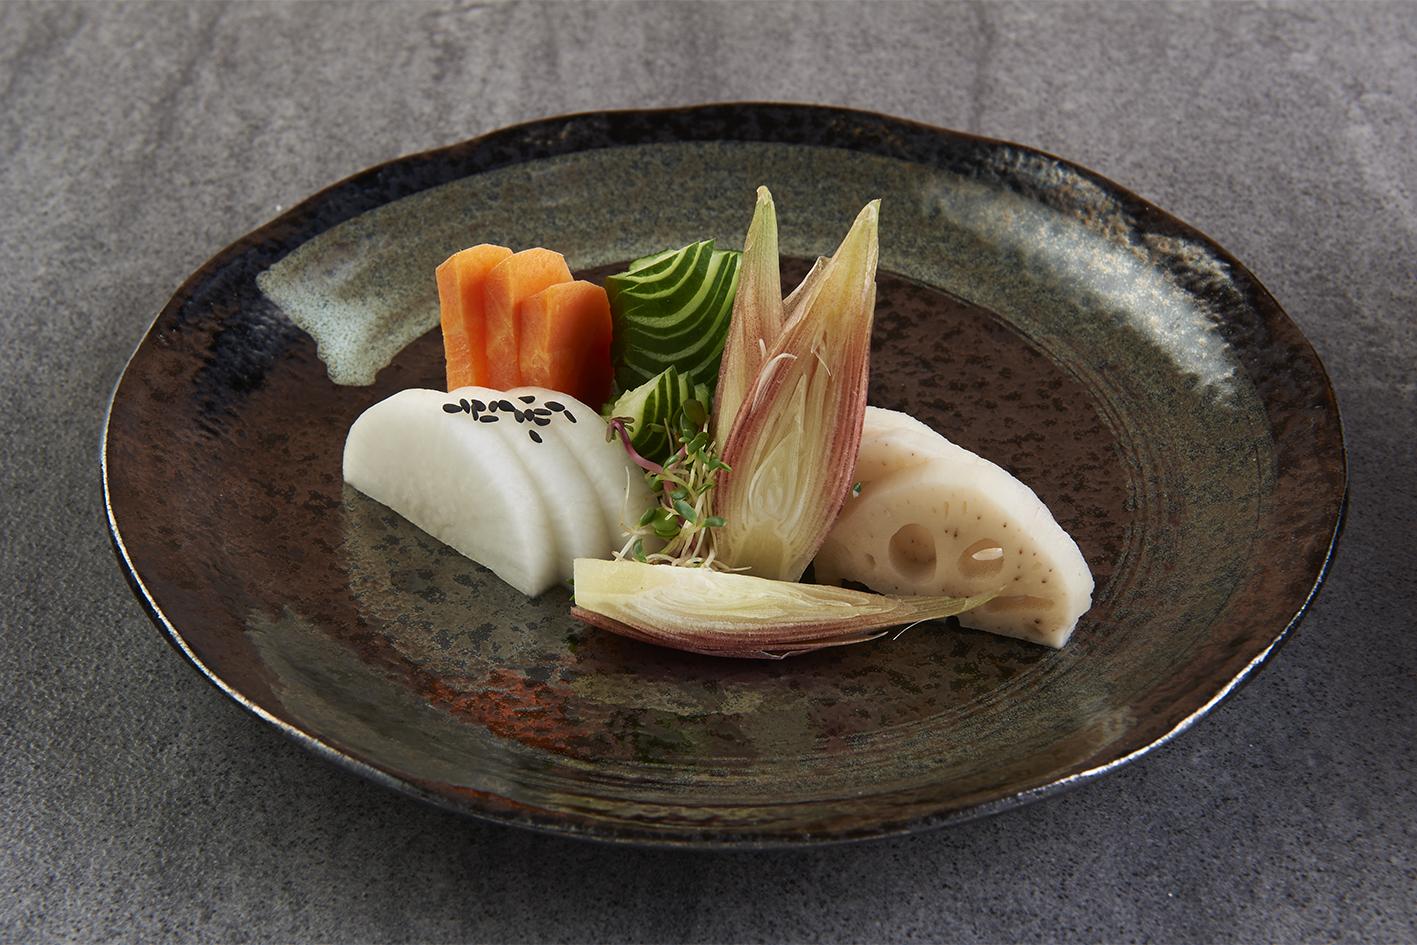 01_appetizers_a02-yasai-zuke-moriwase